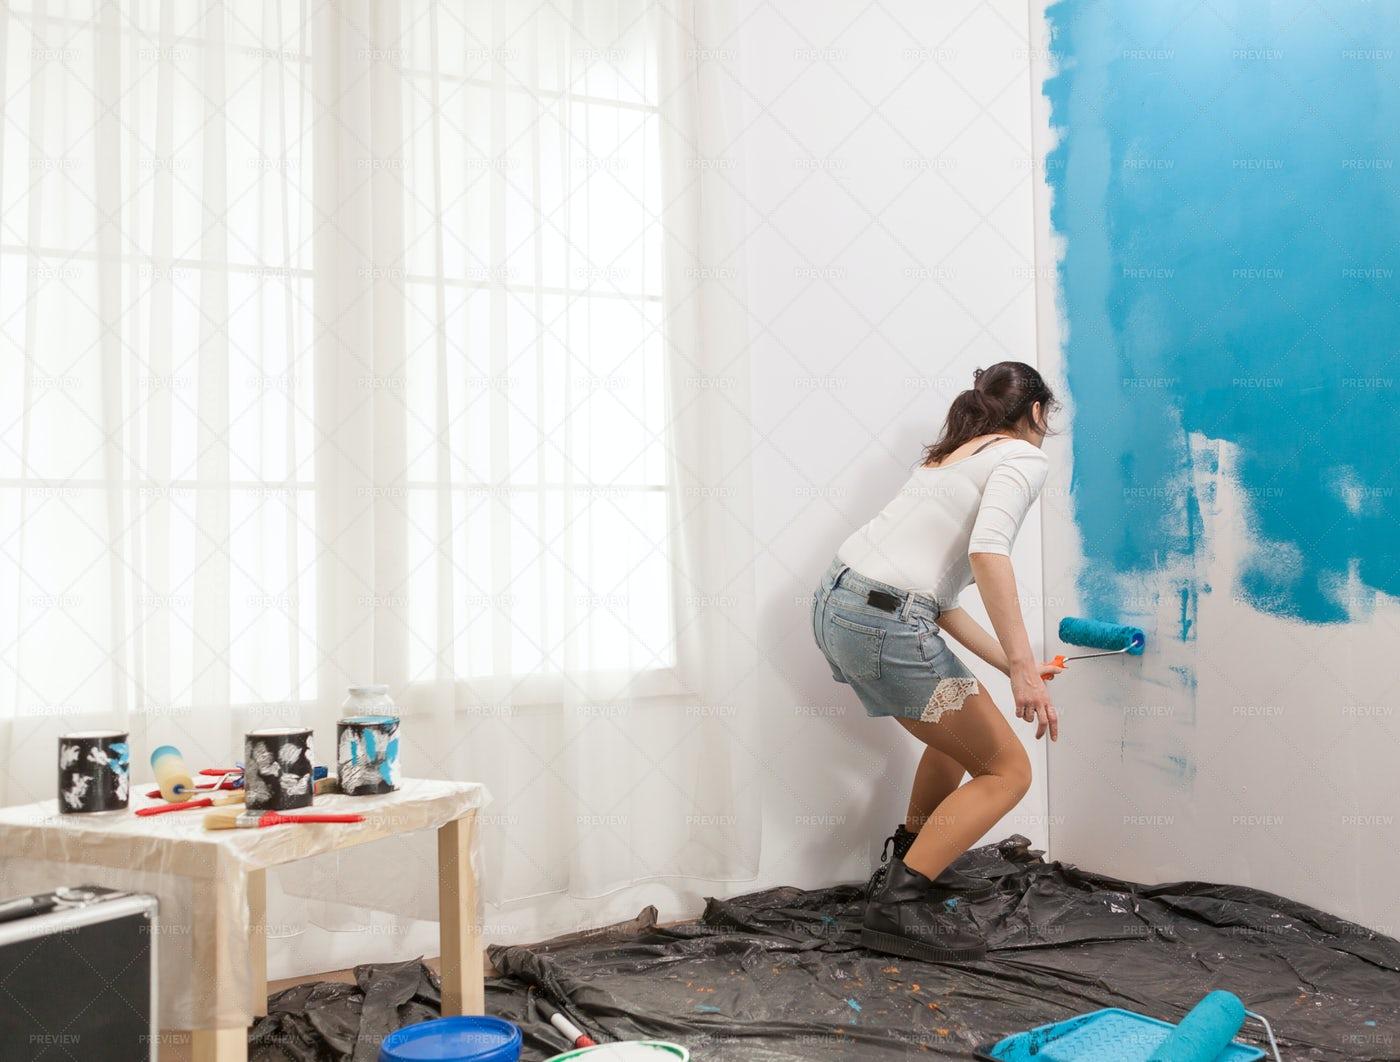 Painting An Apartment Wall: Stock Photos